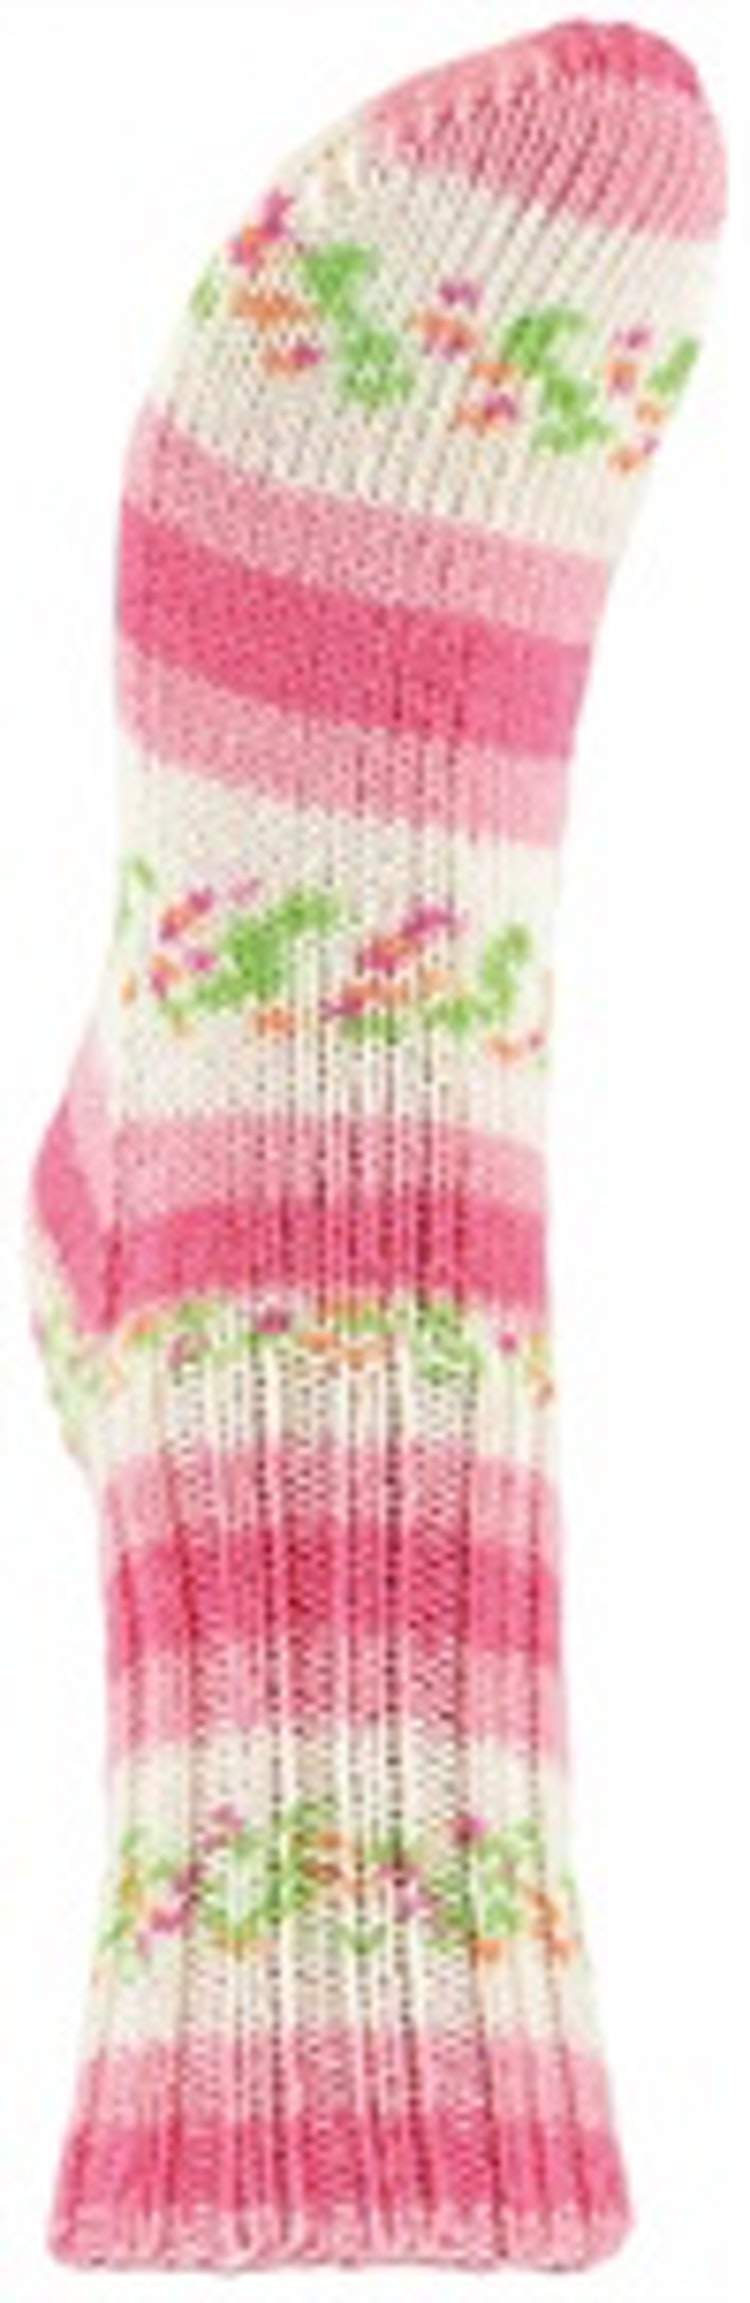 Soft Raggi Pink Print